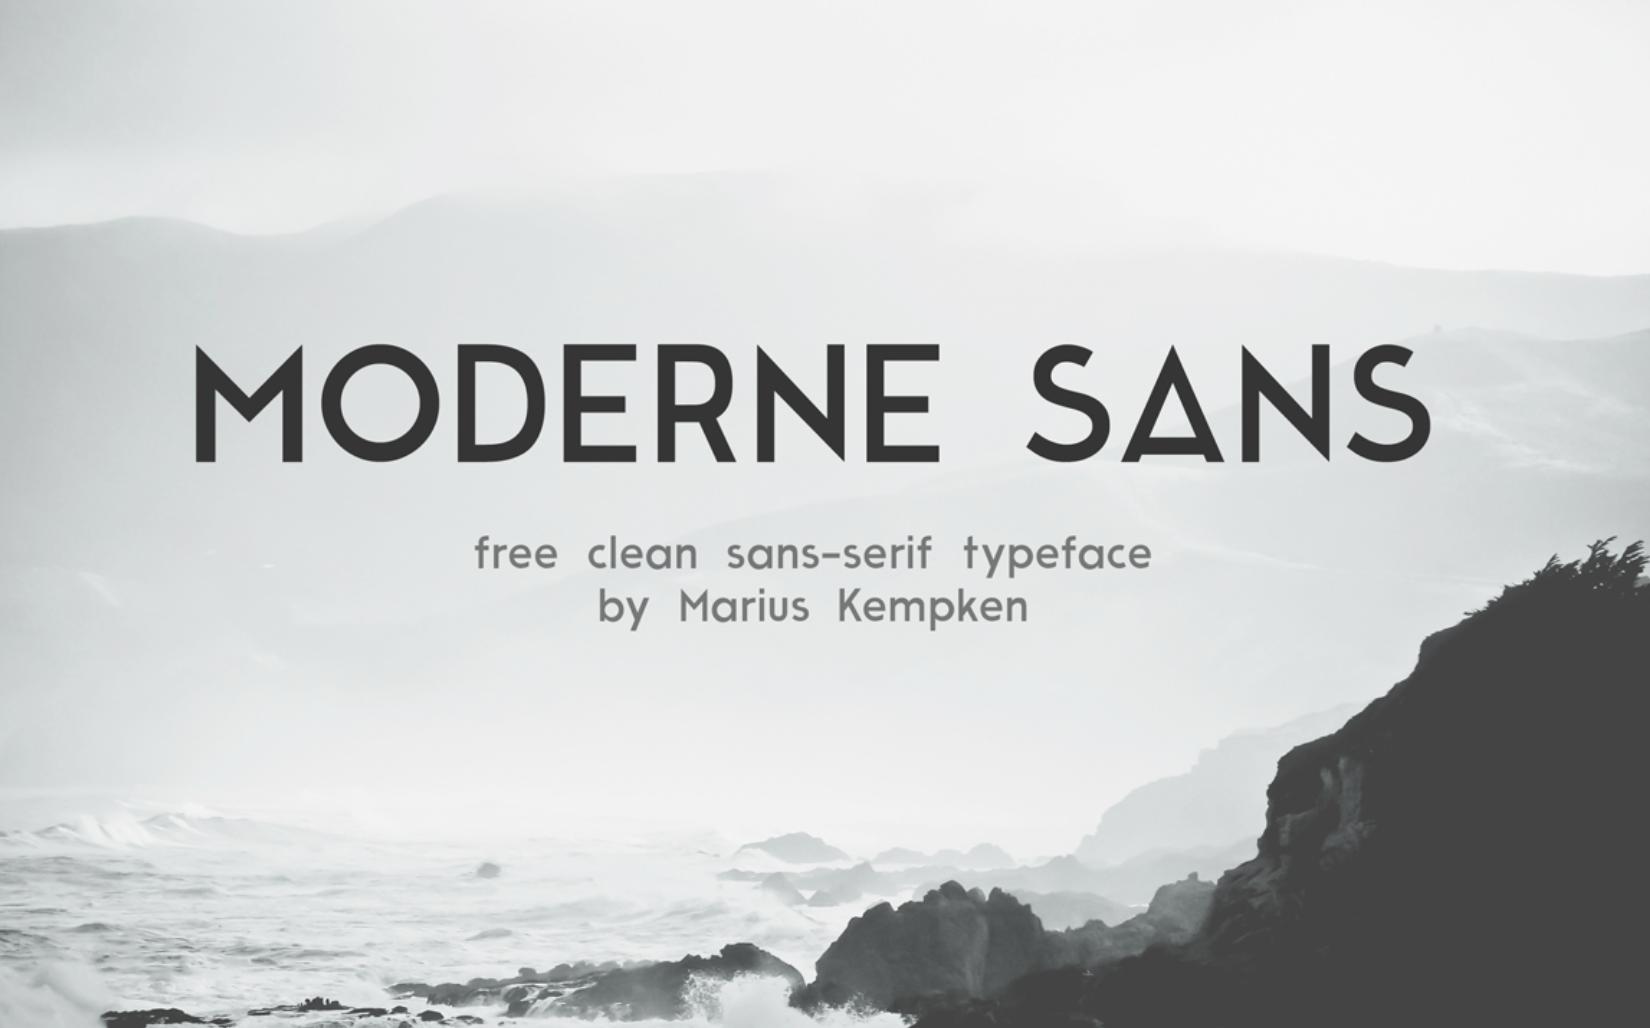 Moderne Sans - Fuentes tipográficas